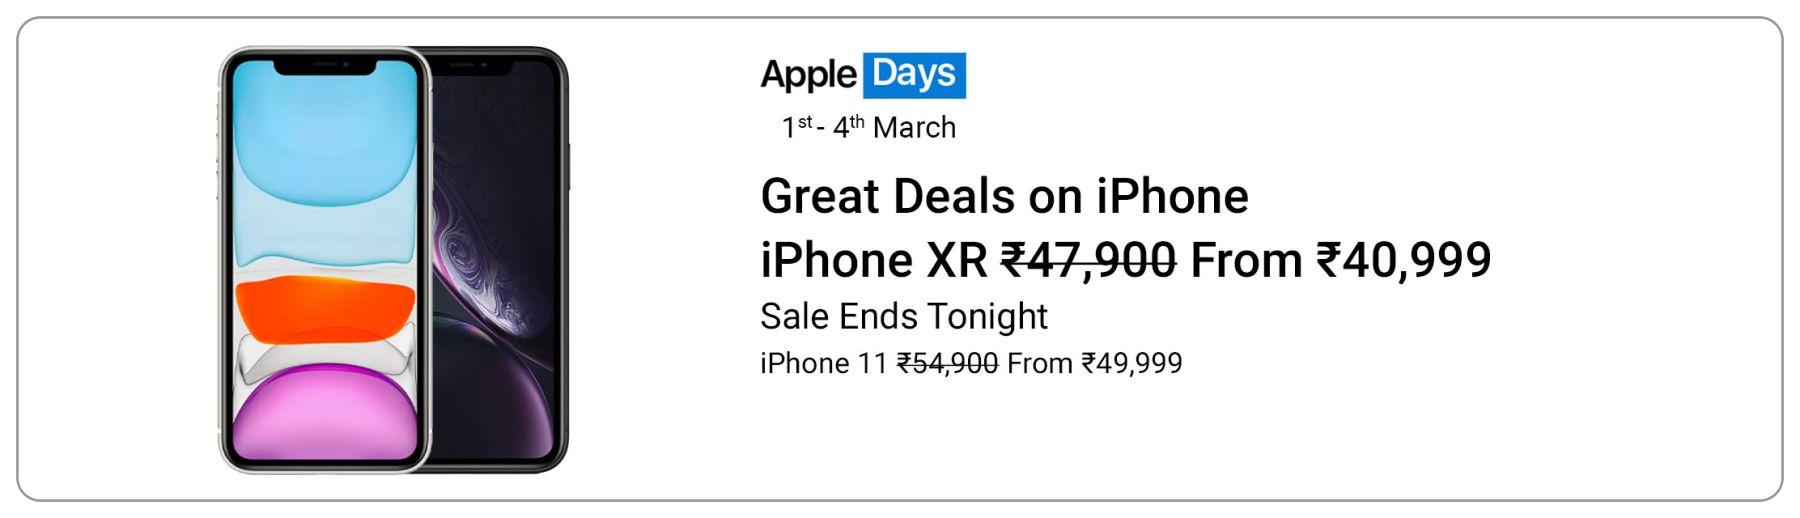 Apple Days Mar 21